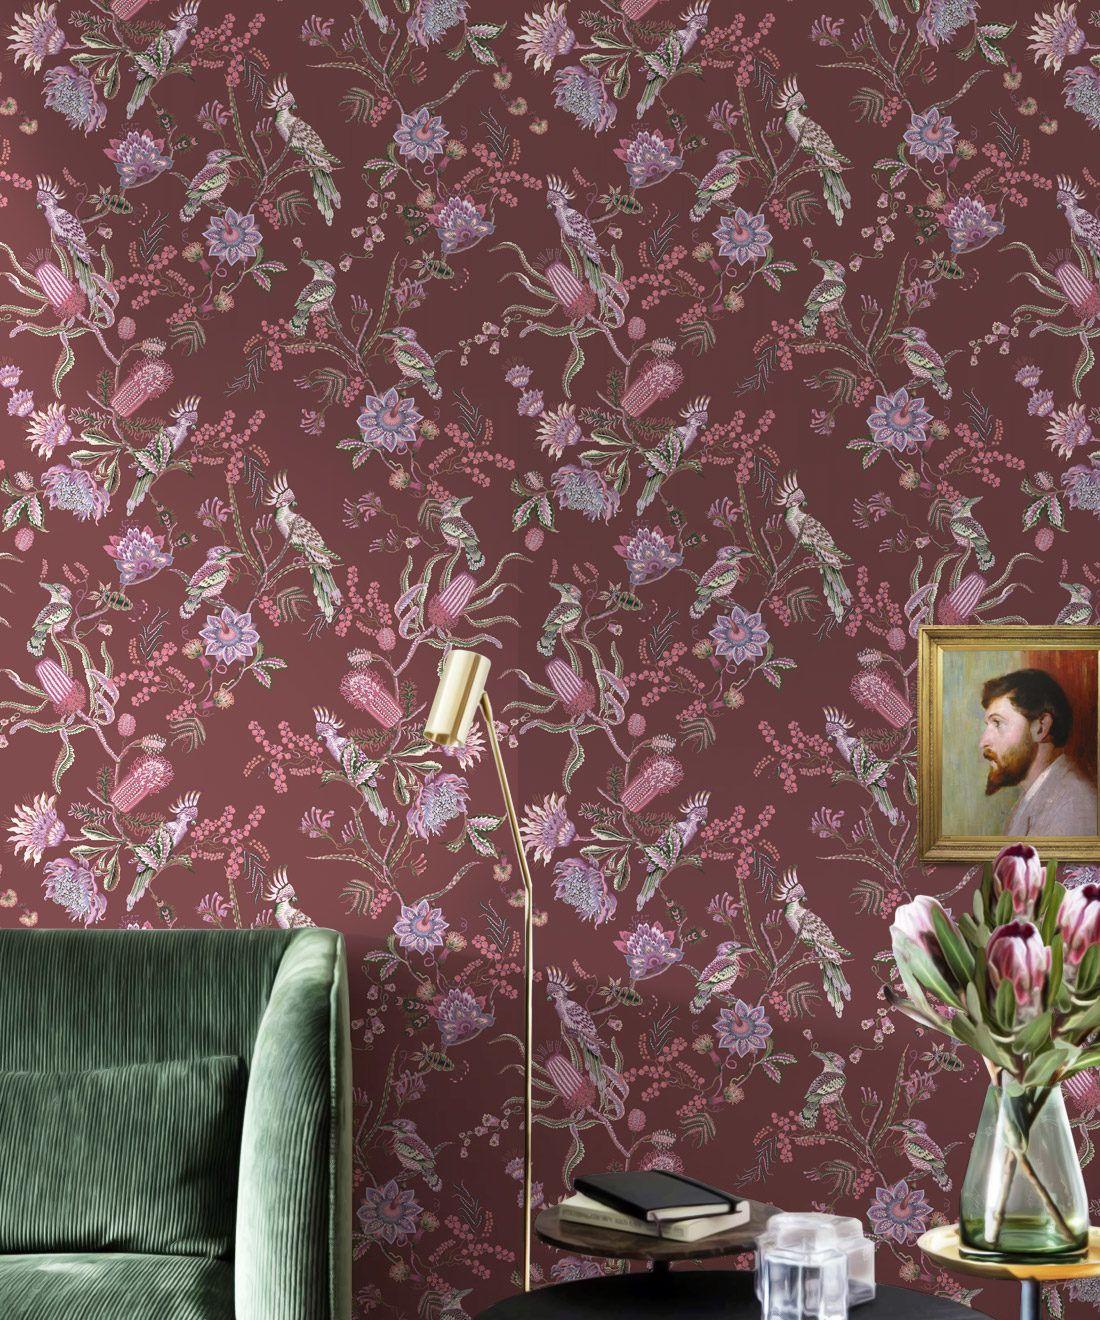 Matilda Wallpaper • Cockatoo, kookaburra • Australian Wallpaper • Milton & King USA • Plum Insitu